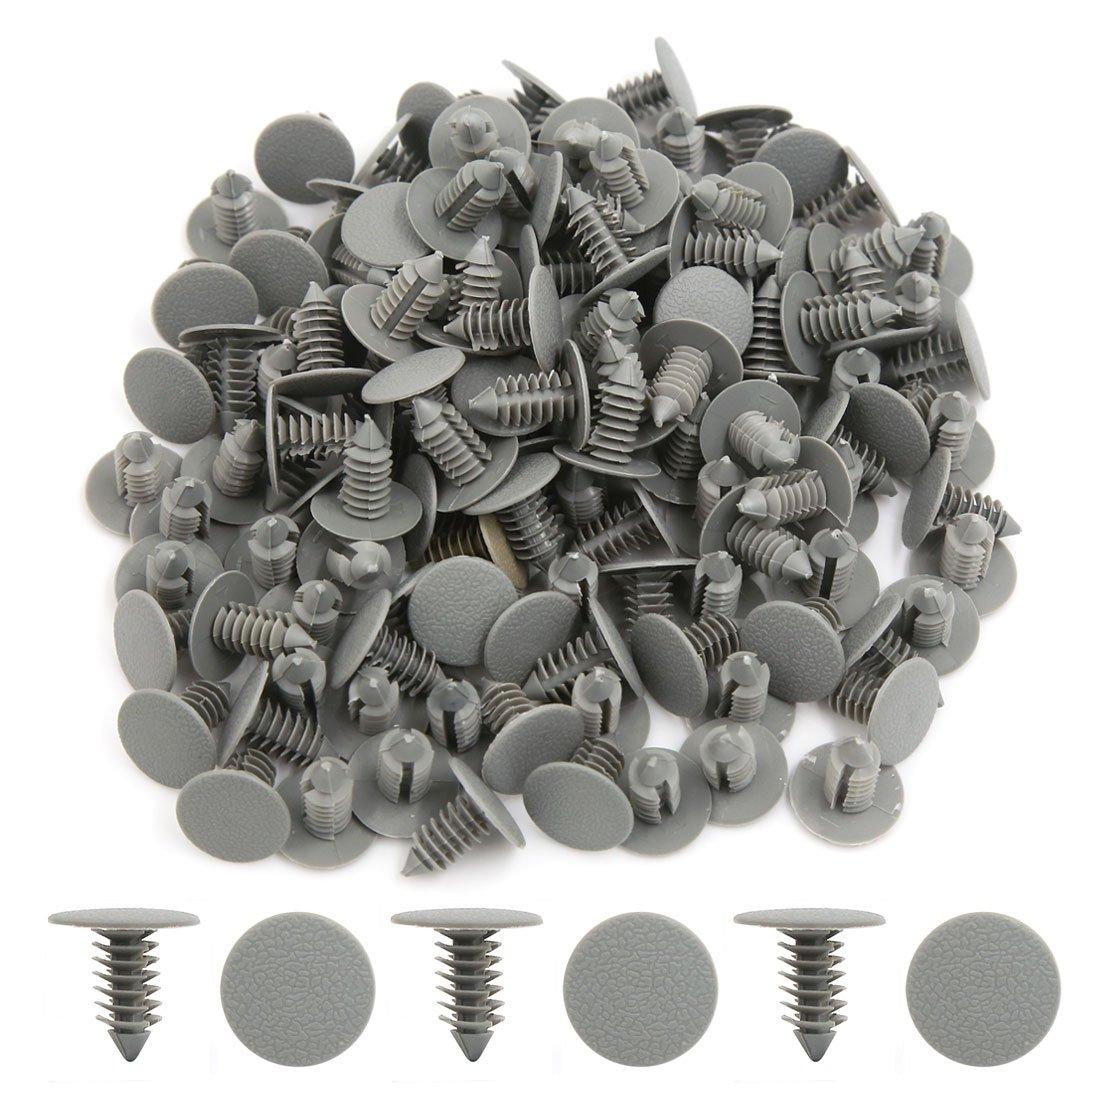 uxcell 50 Pcs Gray 9mm Dia Hole Plastic Rivets Fasteners Bumper Fender for Car Auto